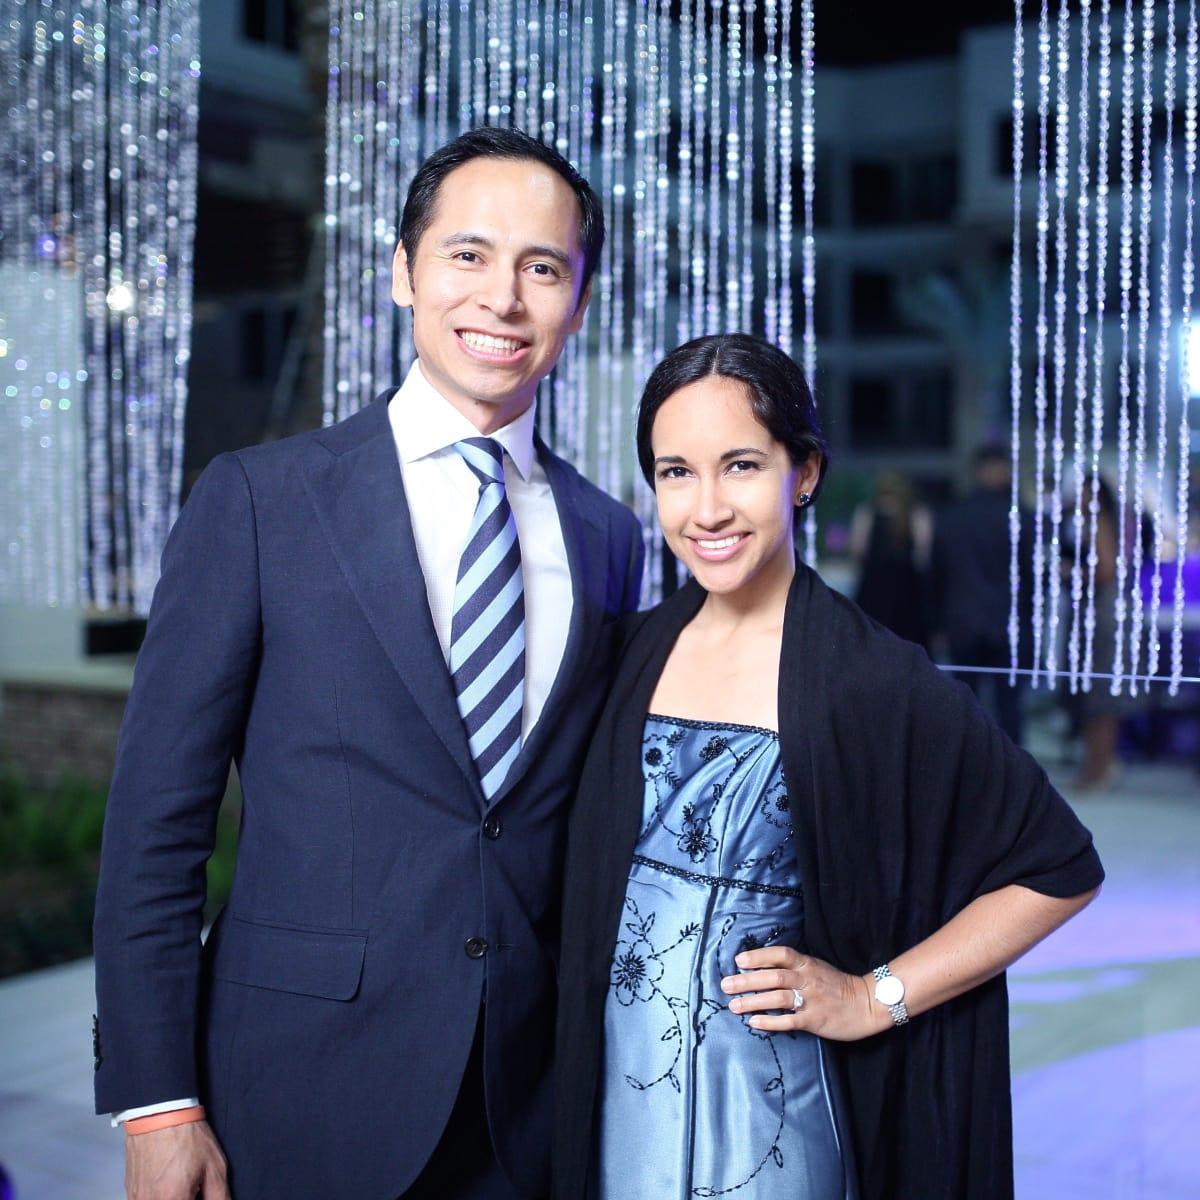 Houston, Big Brothers Big Sisters YP The Big Prom, Feb 2017, Geraldo Juarez, Yvonne Juarez